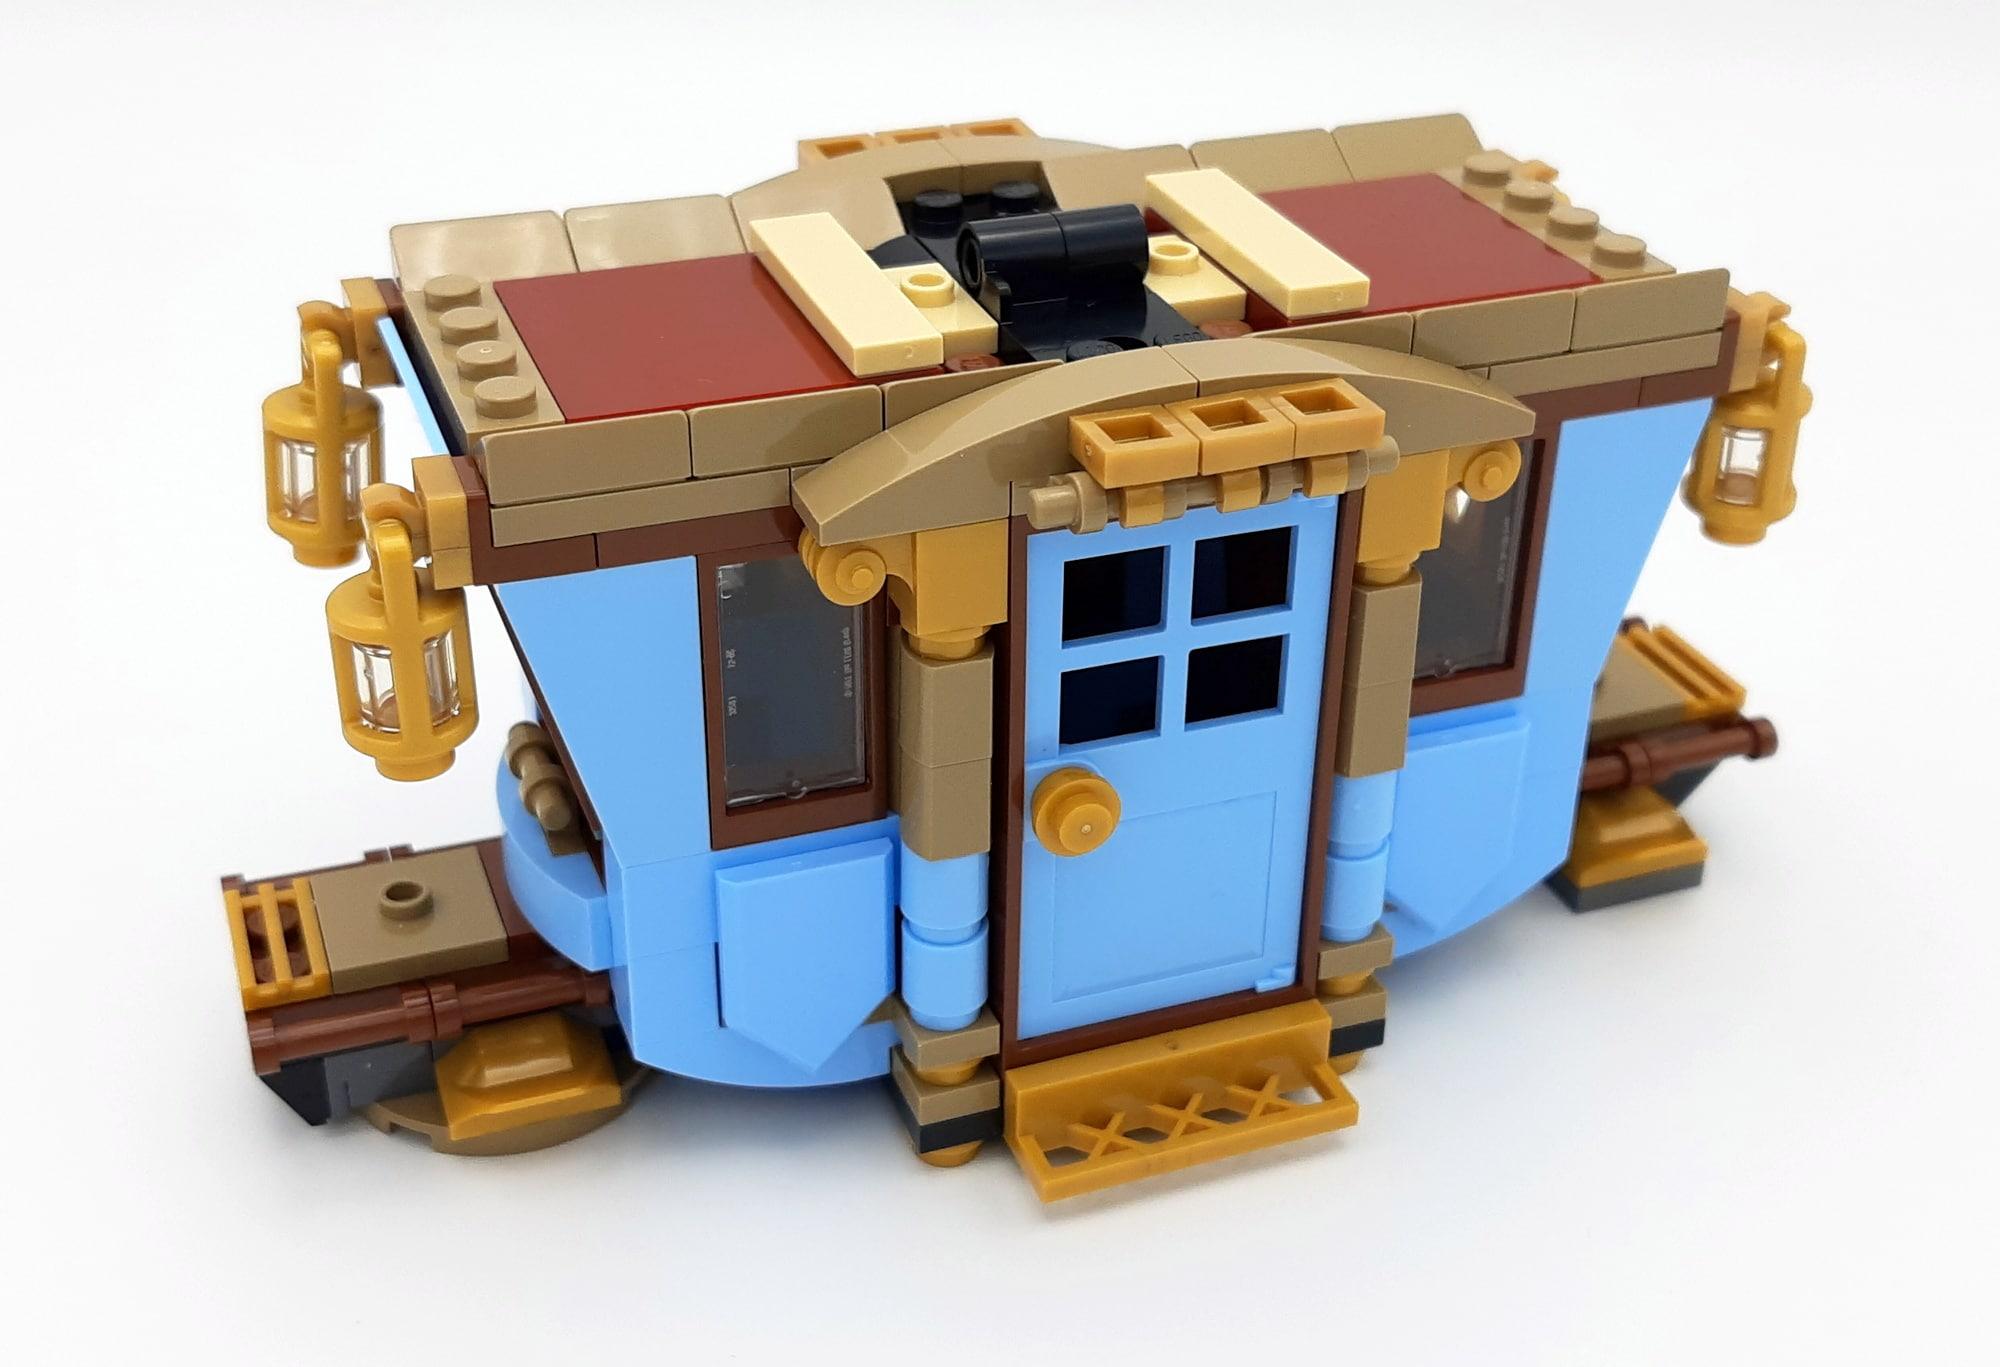 LEGO 75958 Harry Potter Beauxbatons Kutsche Bauabschnitt 2 Seite